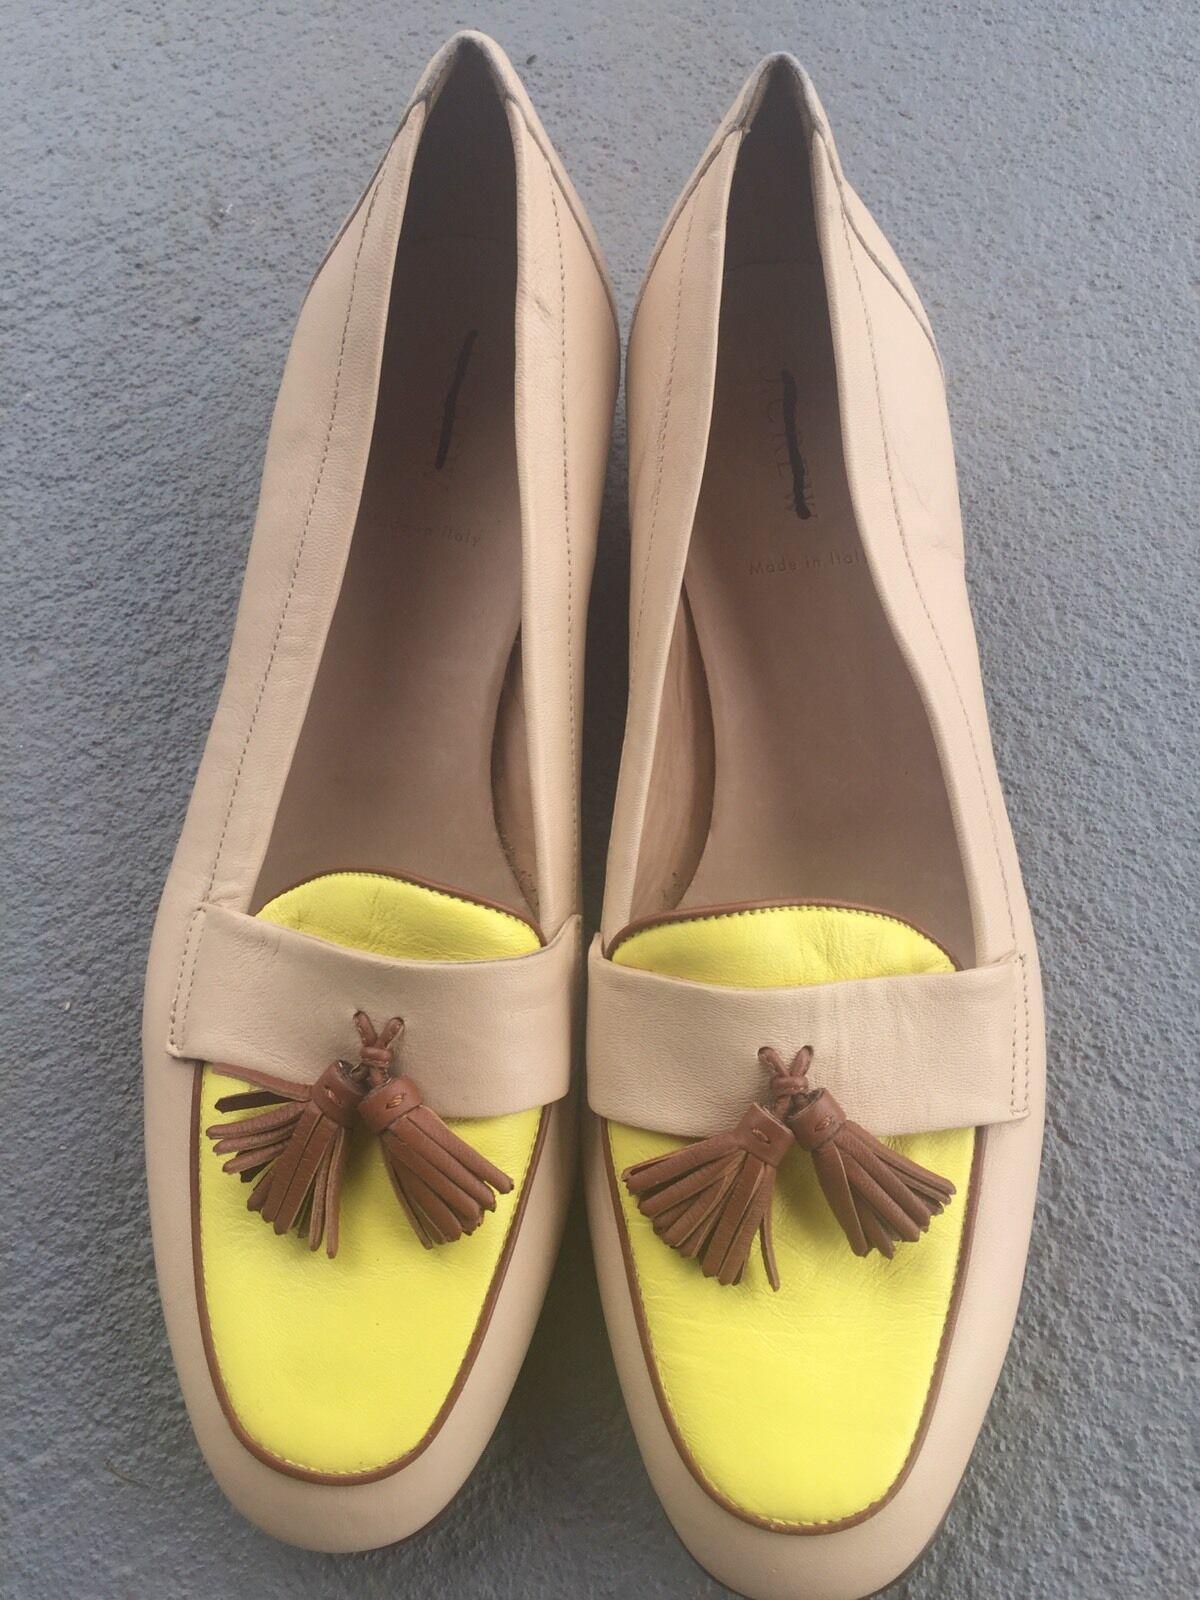 J CREW BIELLA TASSEL LOAFERS TWO TONE Schuhe SOFT SAND LEATHER FLAT Schuhe TONE 45914 NEW 10 df567f